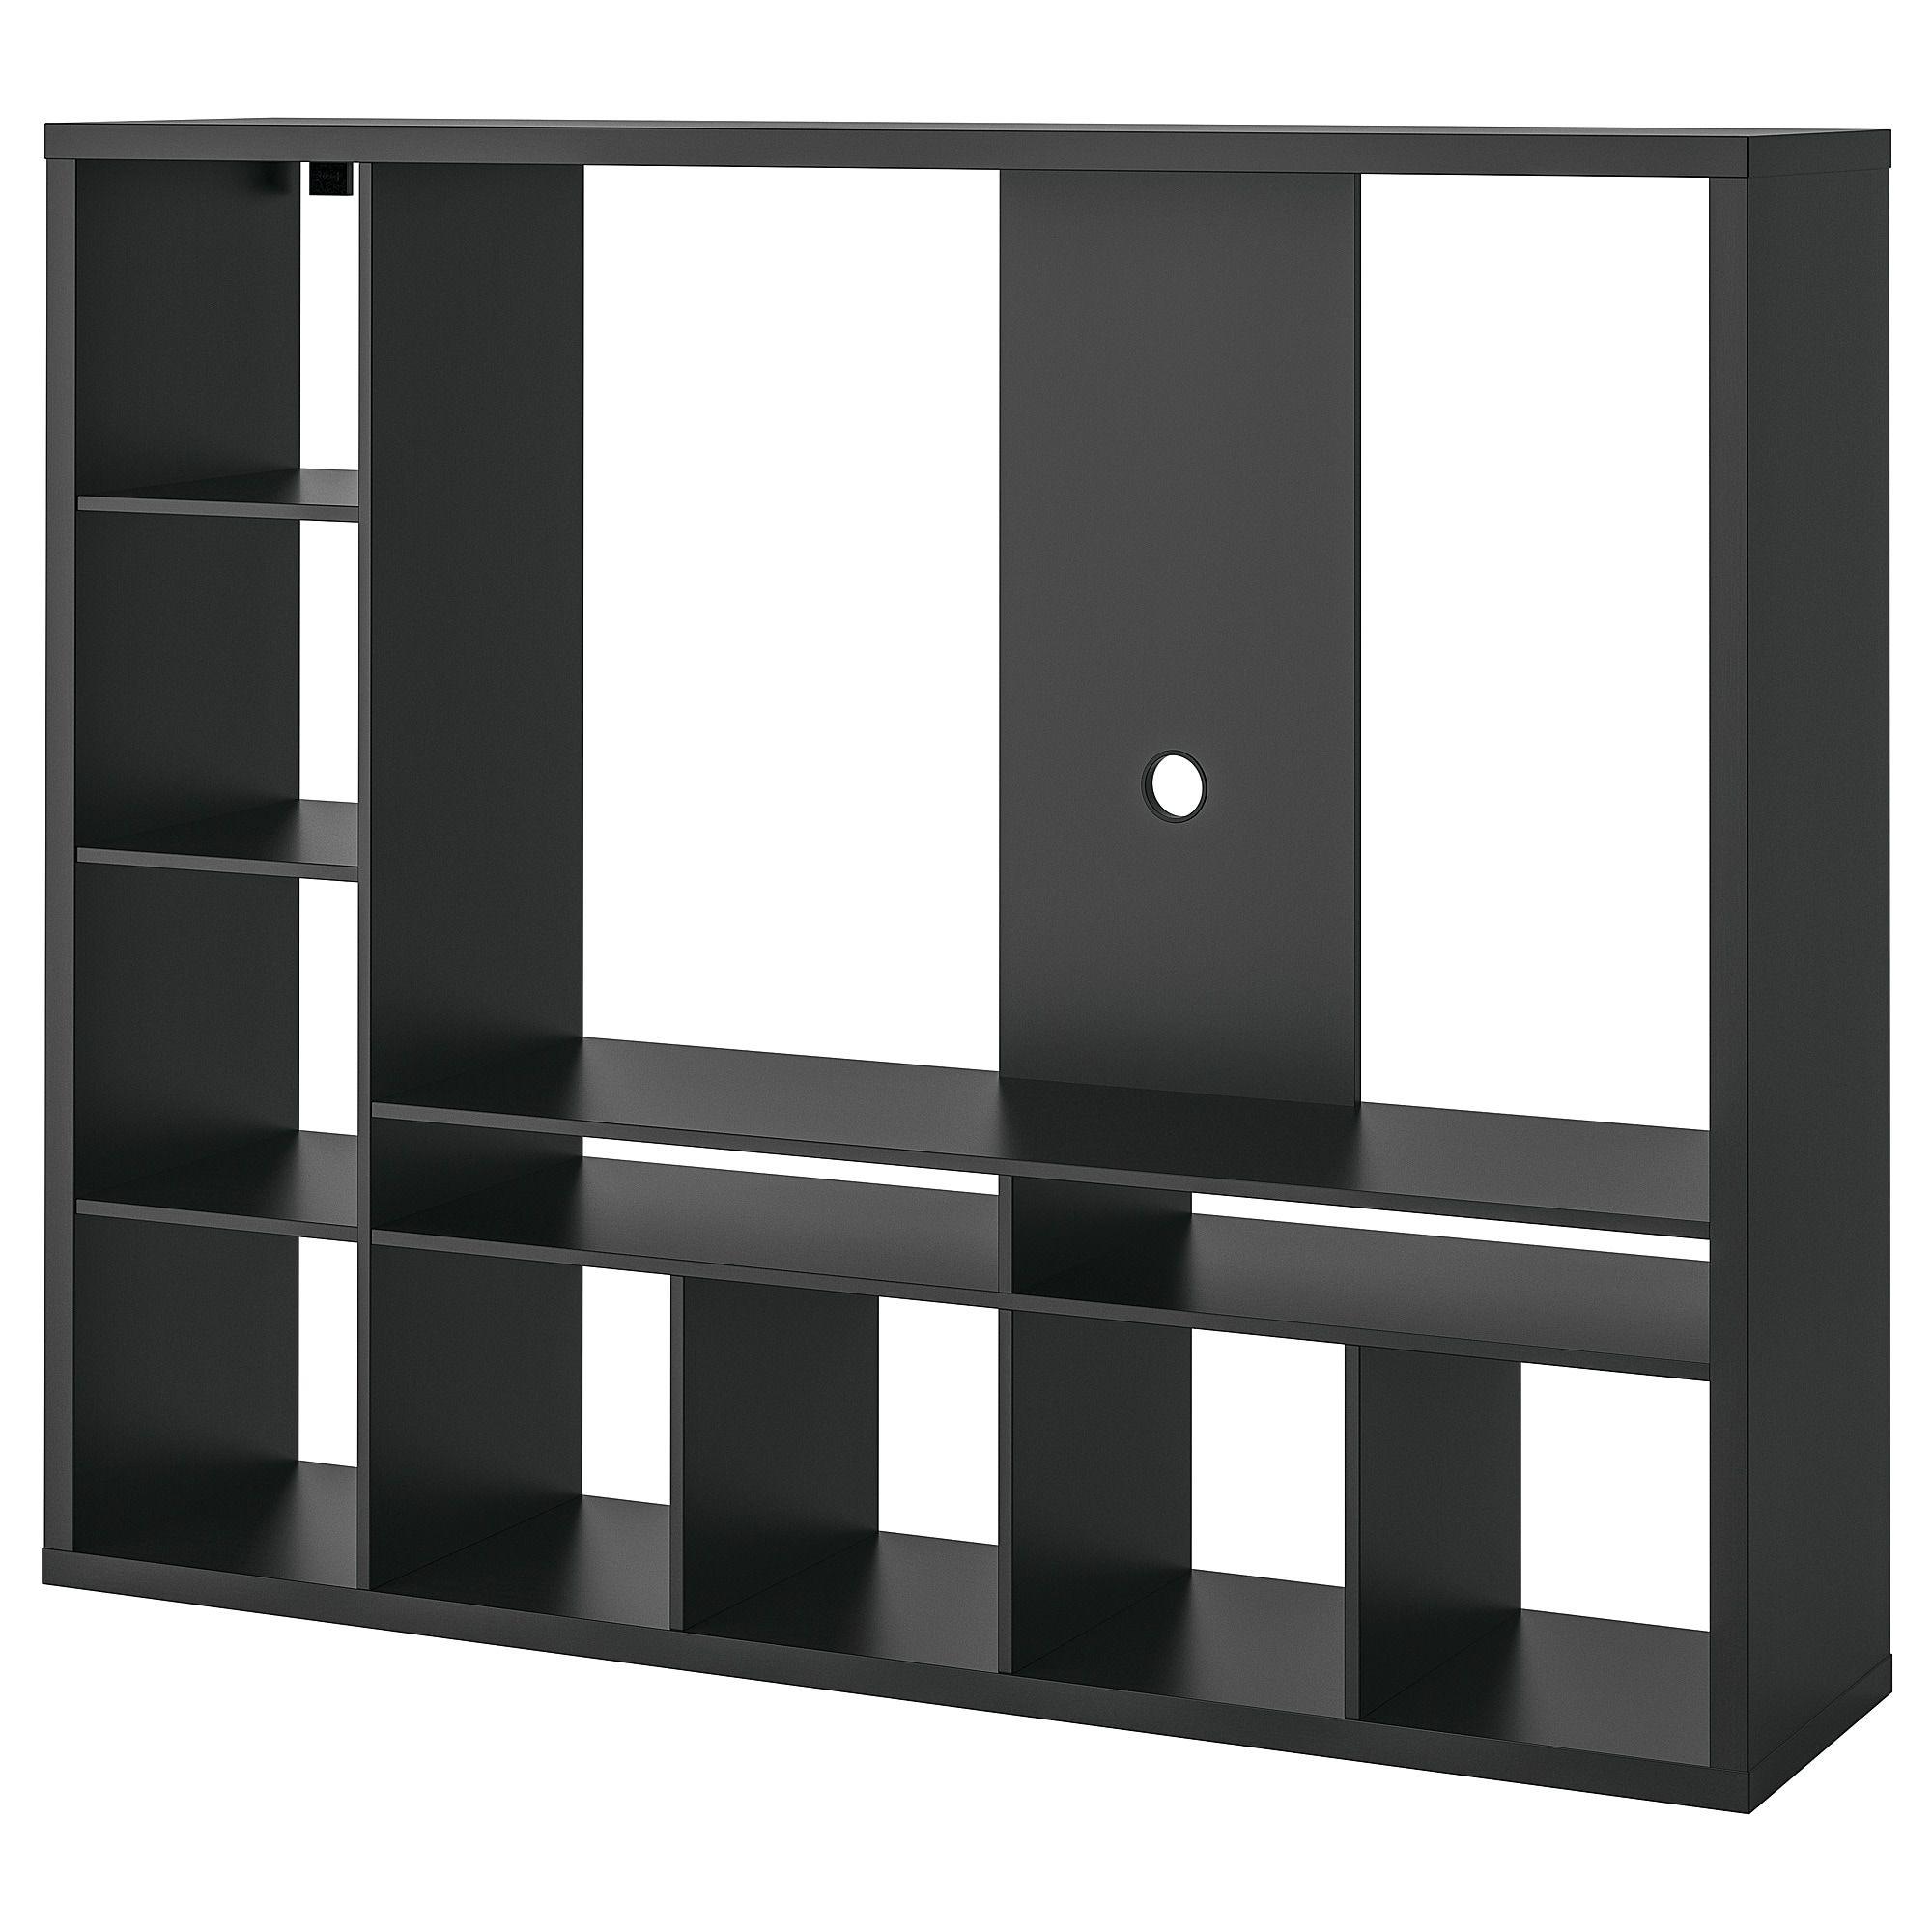 lappland tv storage unit black brown for the home tv storage rh pinterest com